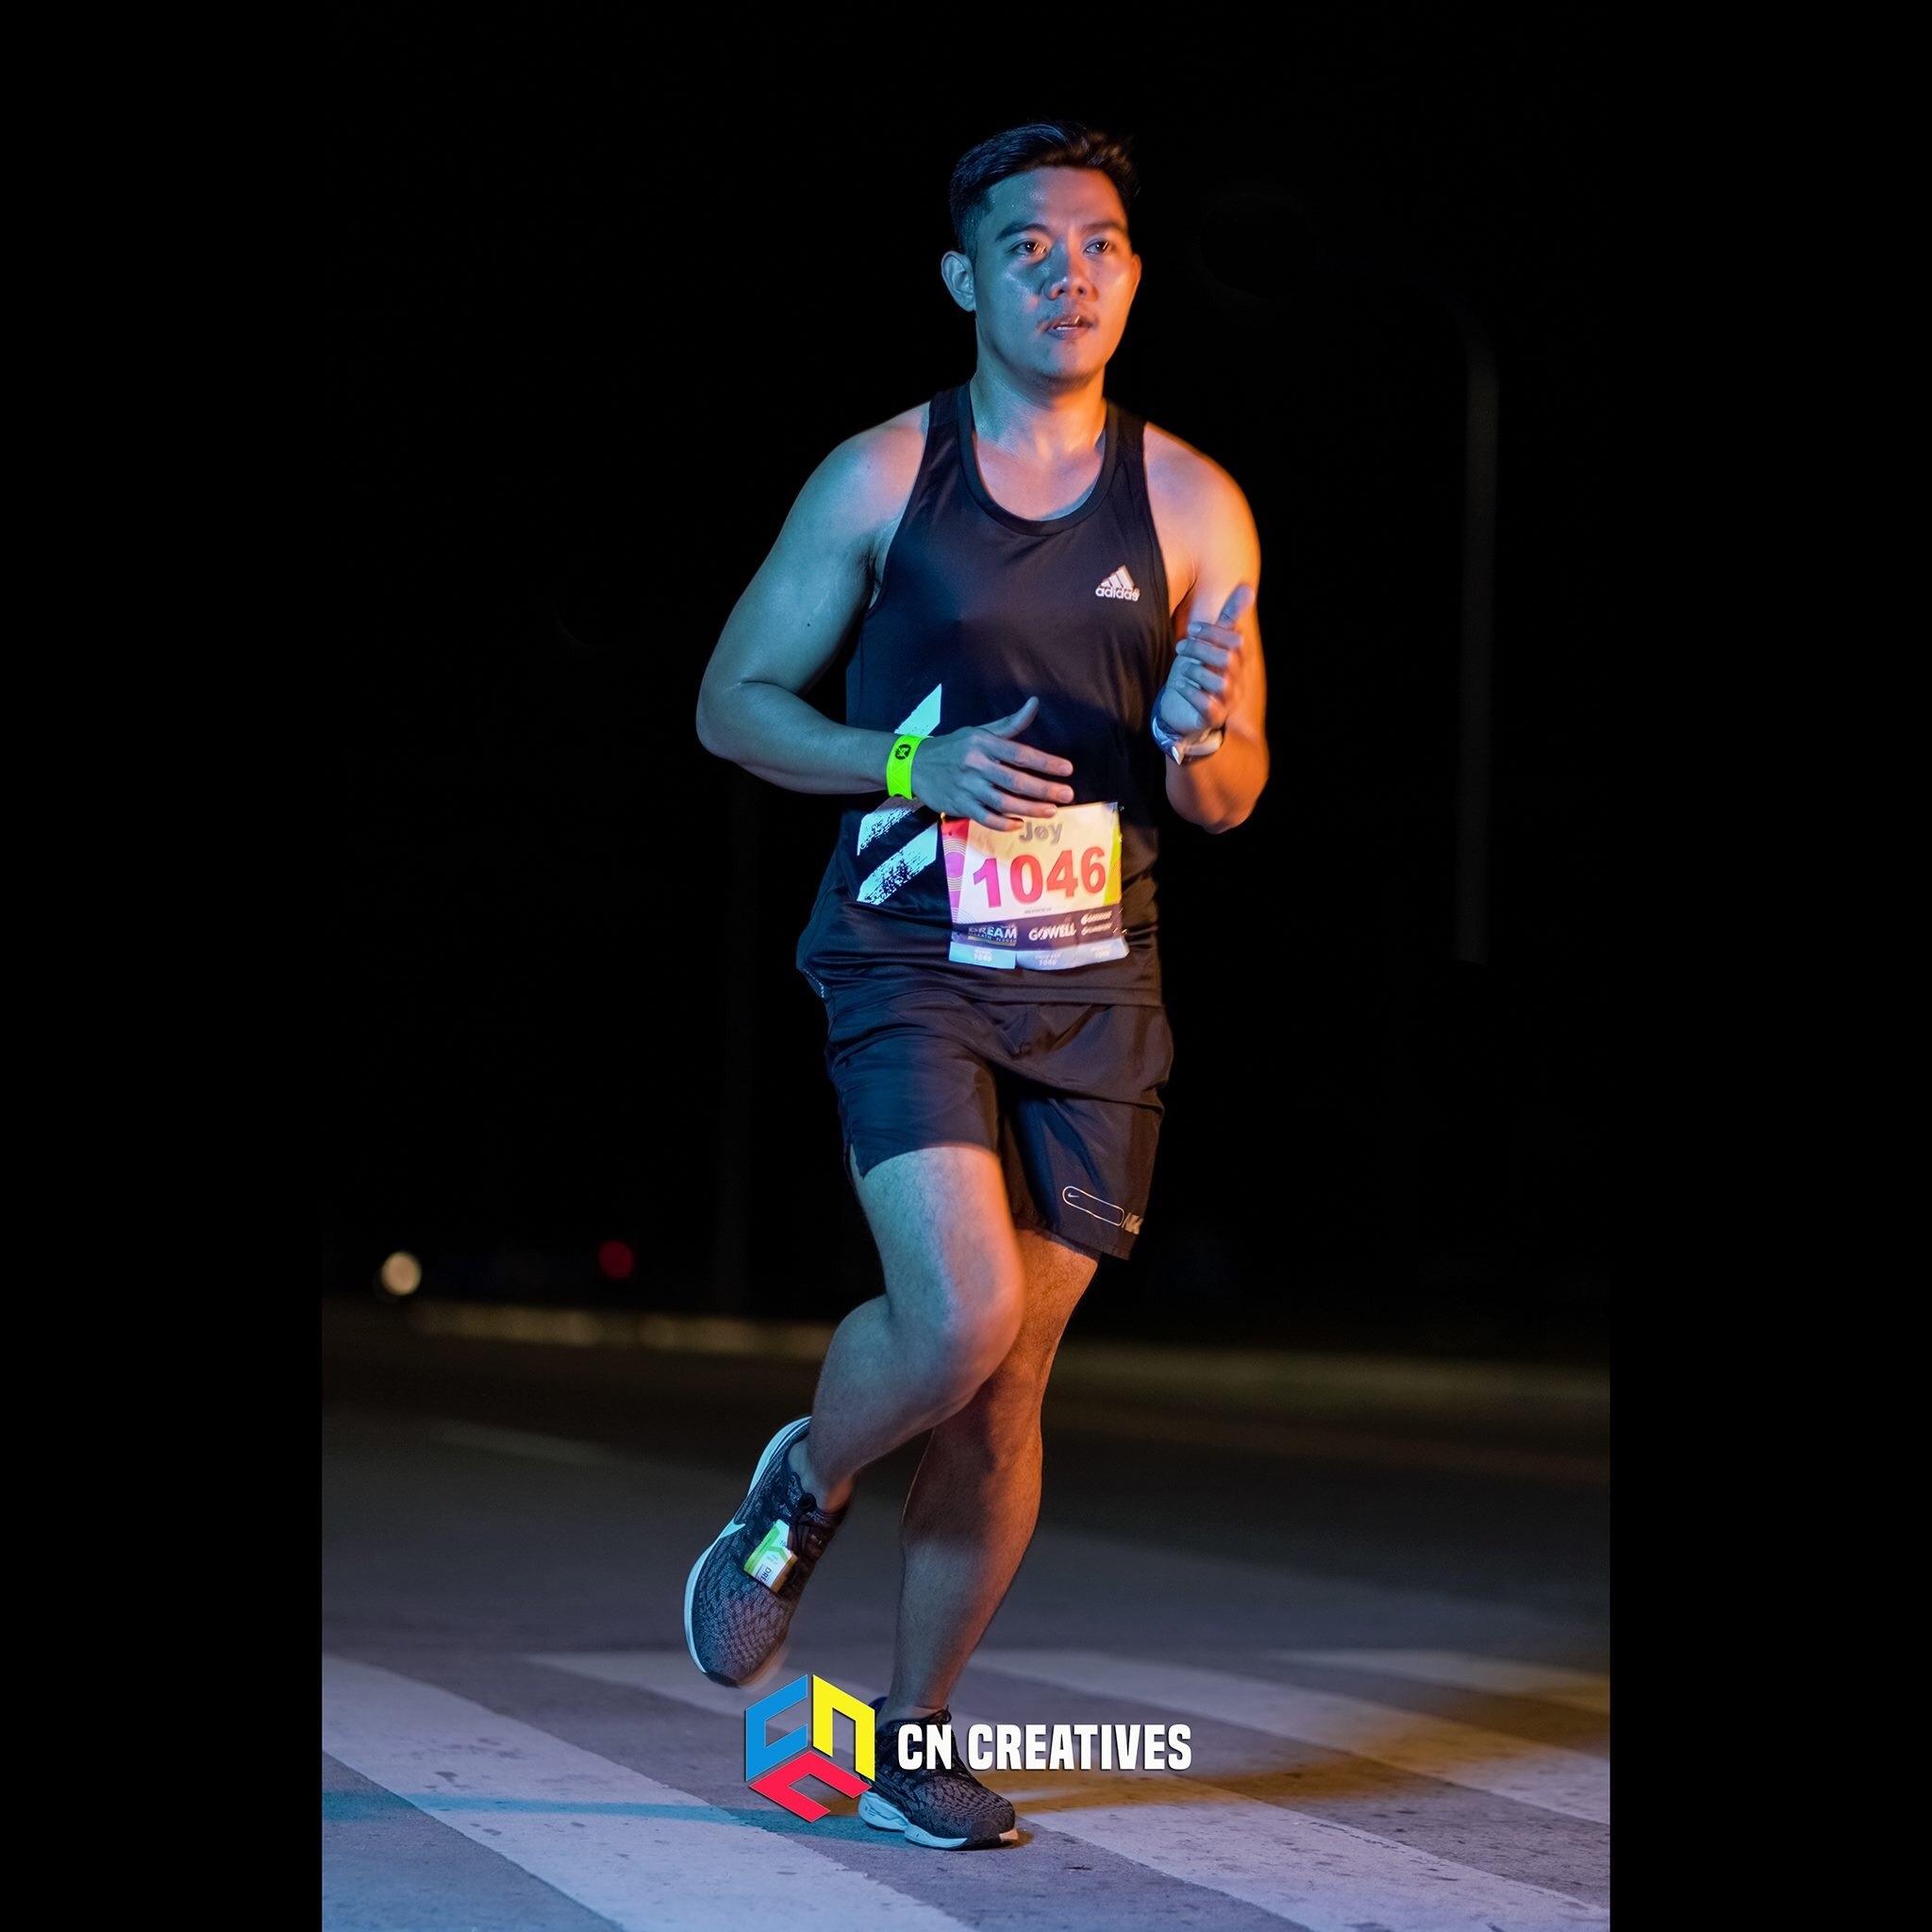 jey yayong bull runner dream marathon